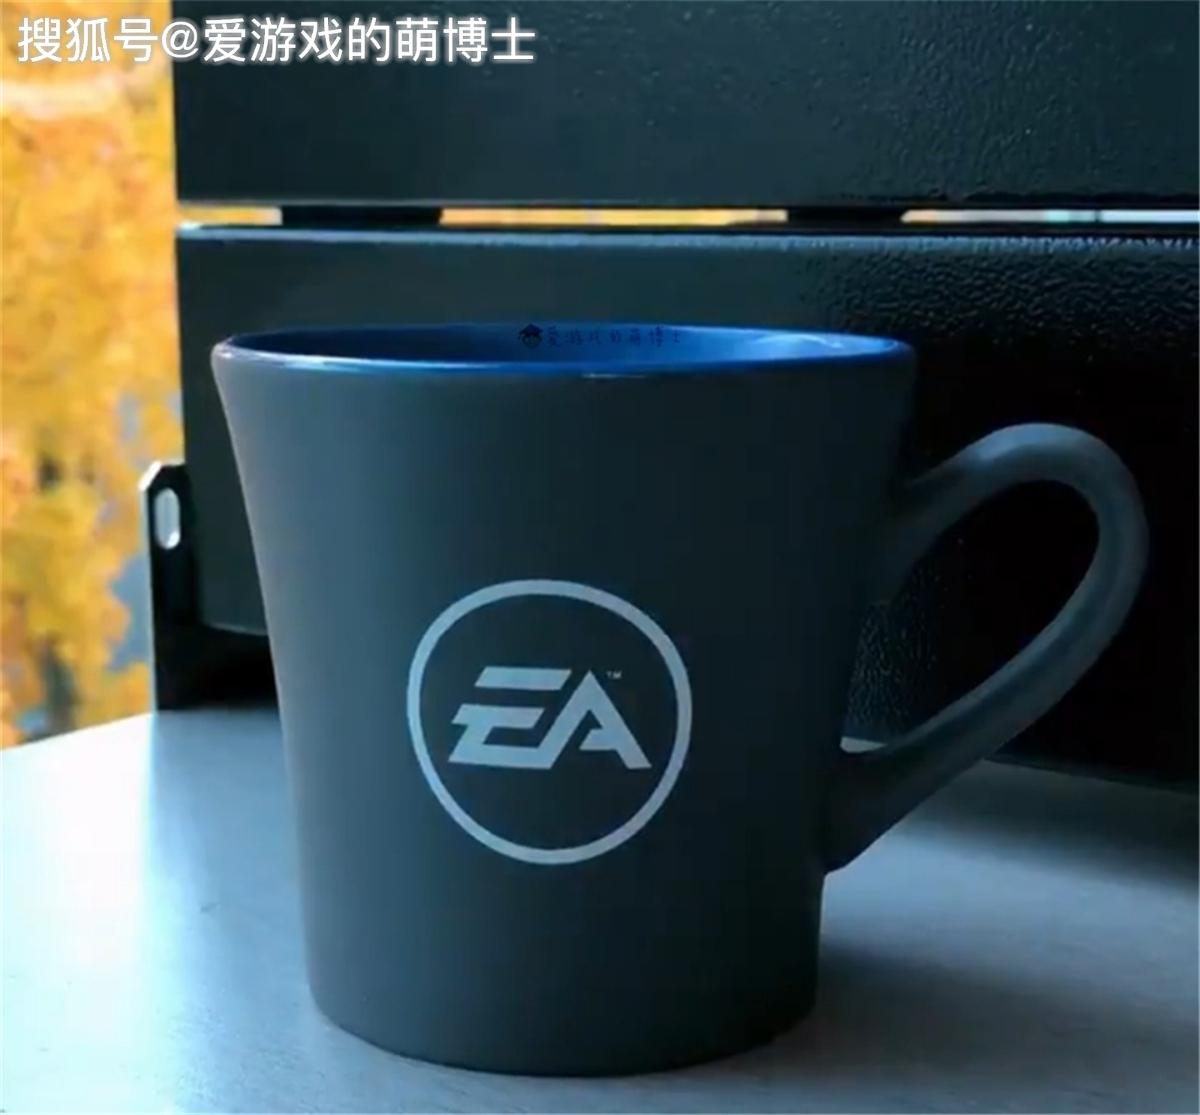 EA和Valve合作了,接下来你可以在steam上玩到这些游戏_Steam